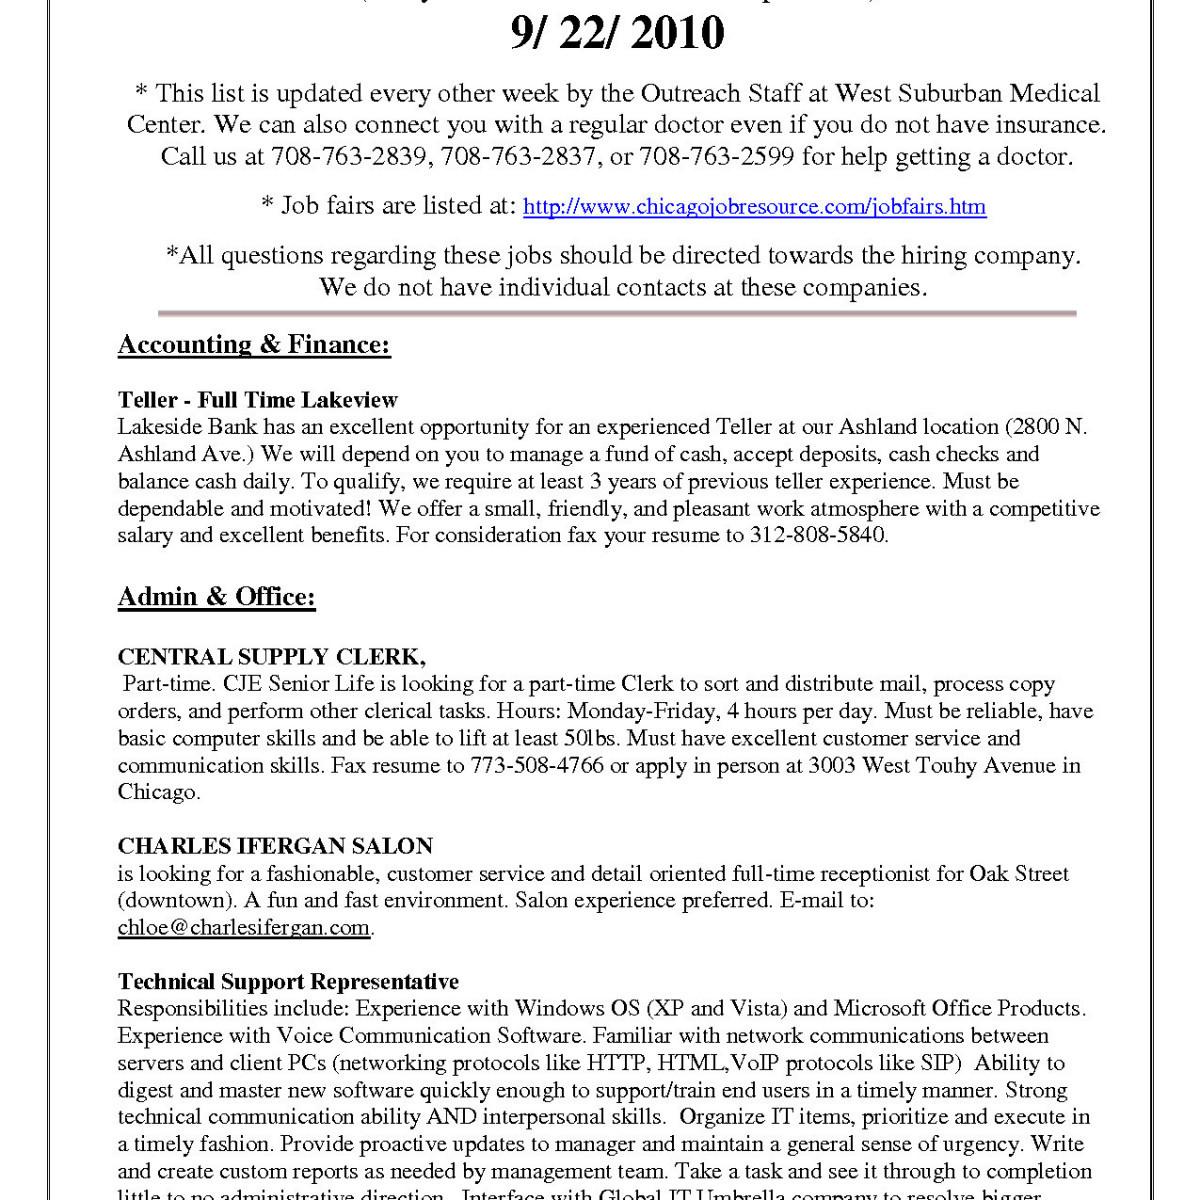 bank teller resume templates free bank teller resume templates no experience bank teller resume templates free download resume template for a bank teller bank teller resume sample canada bank teller resume sample download